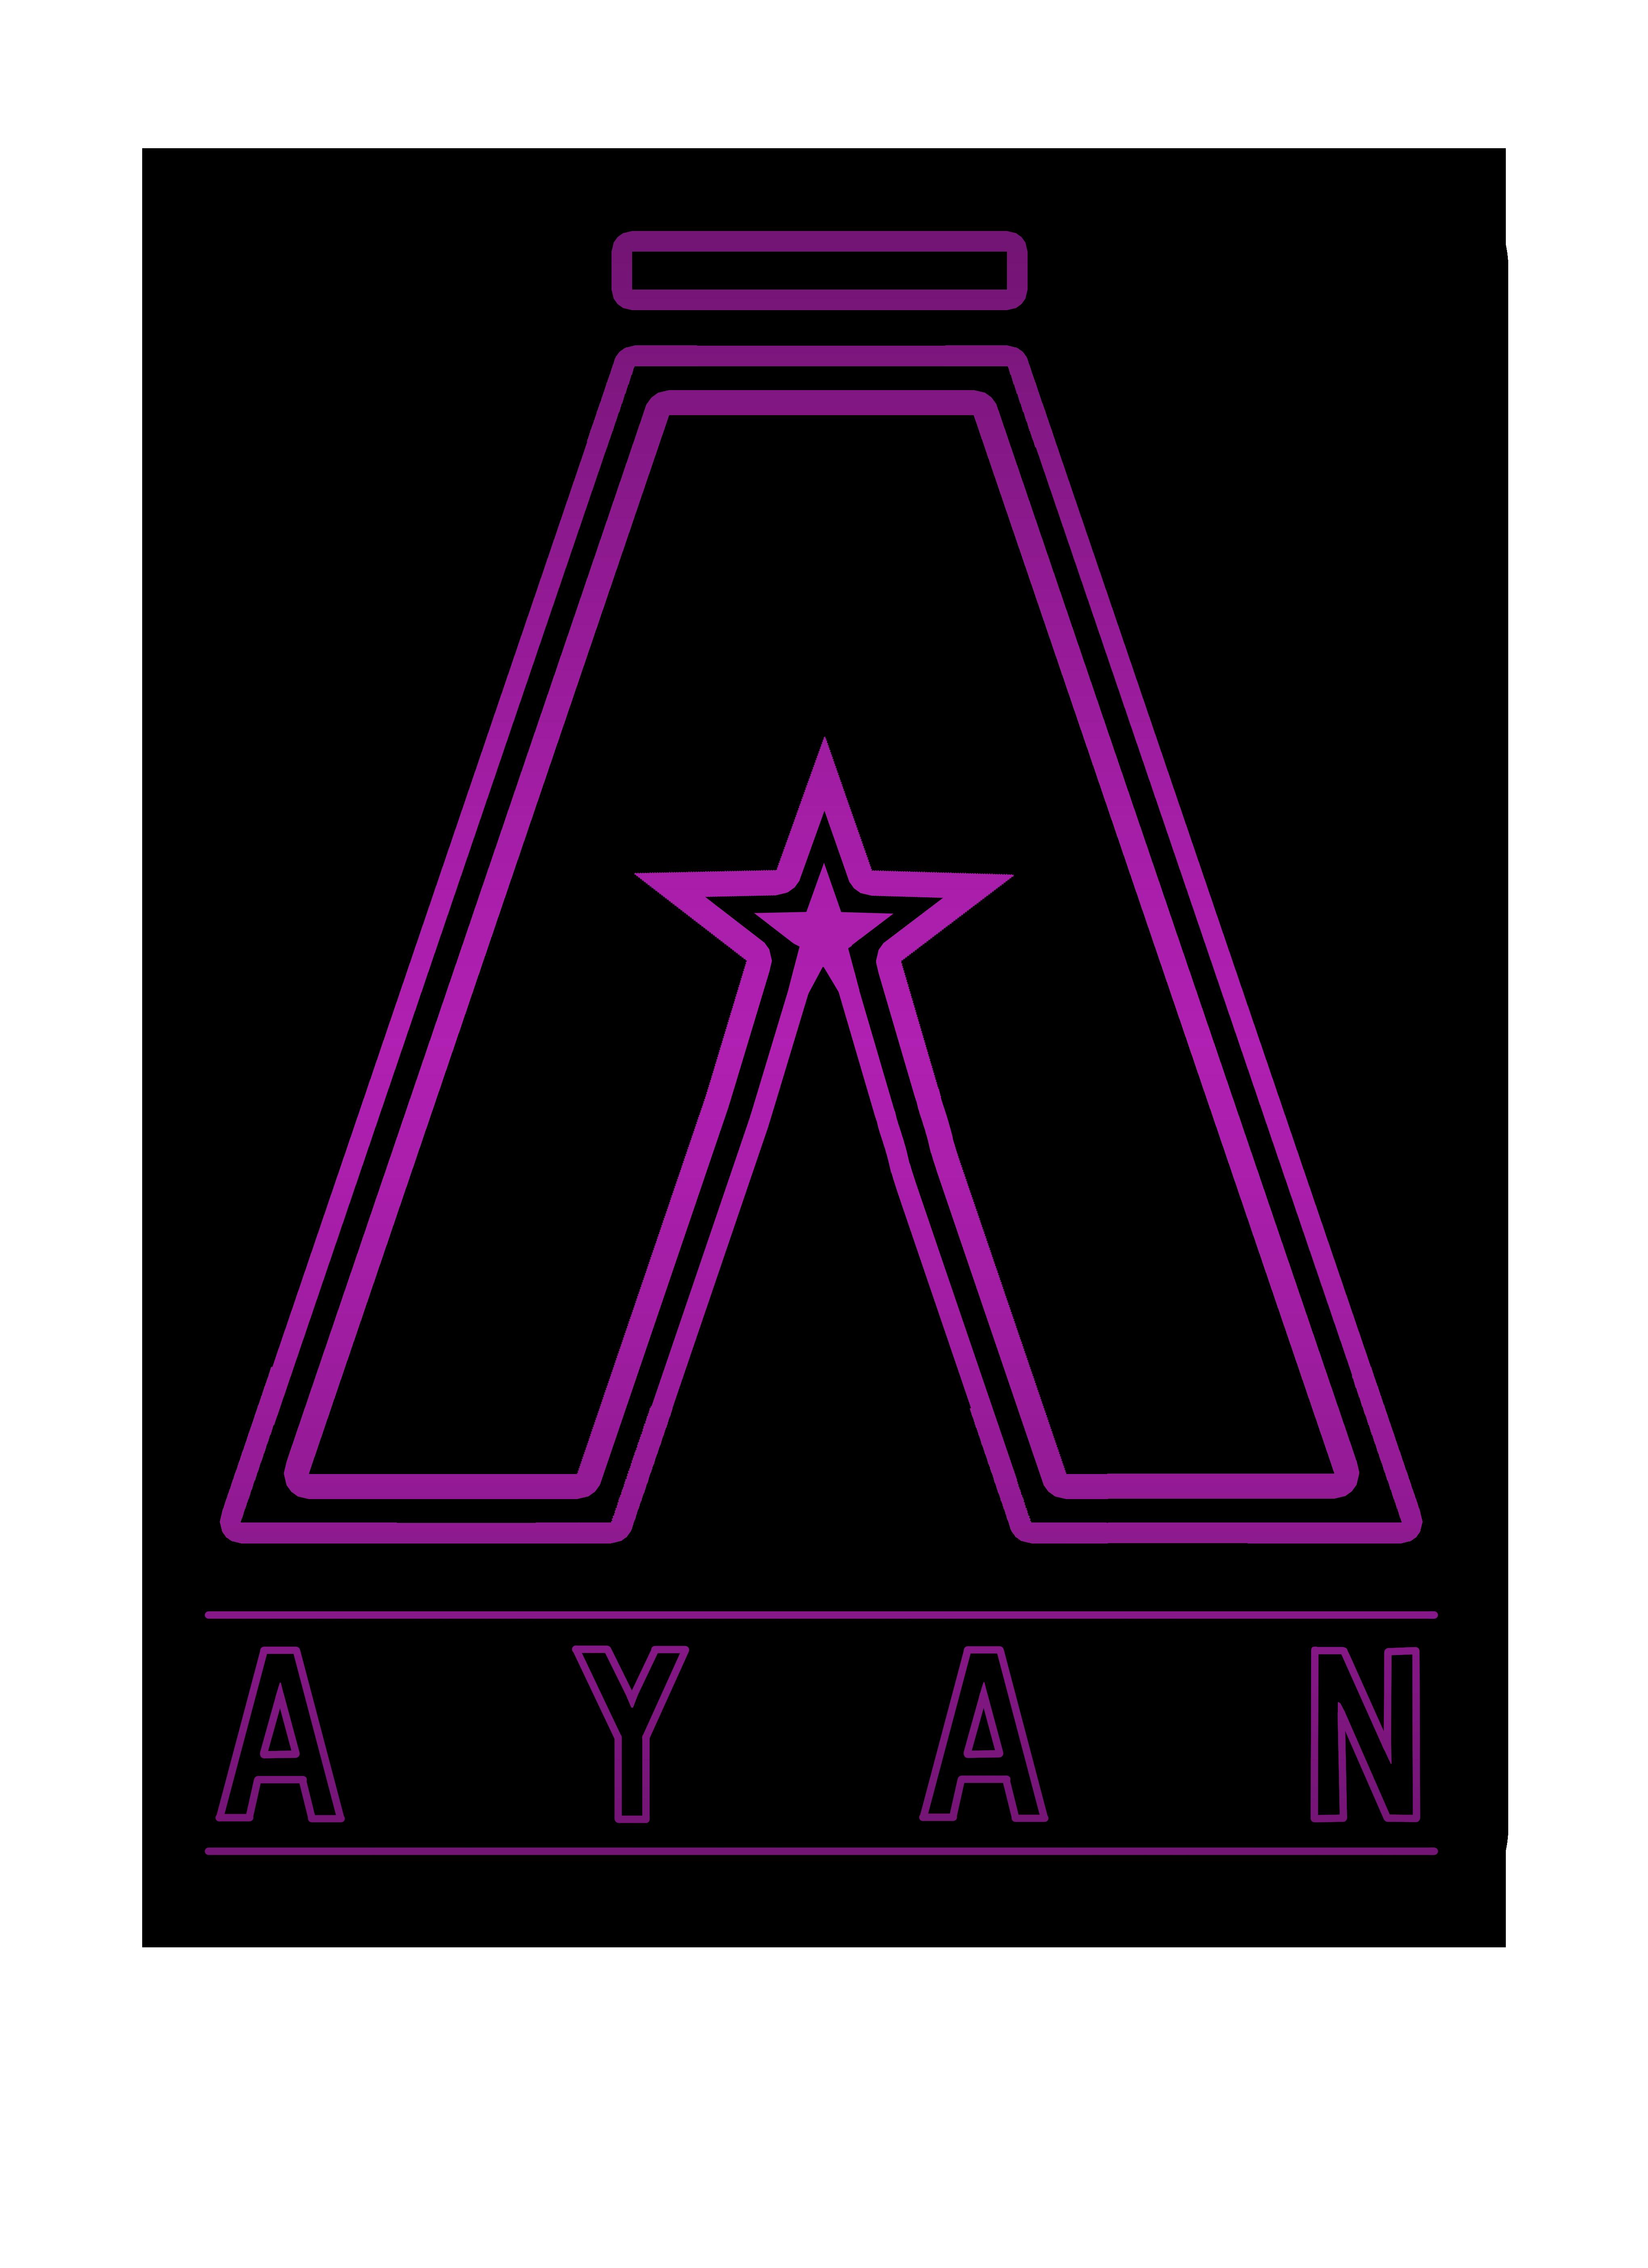 Logotipo Ayan